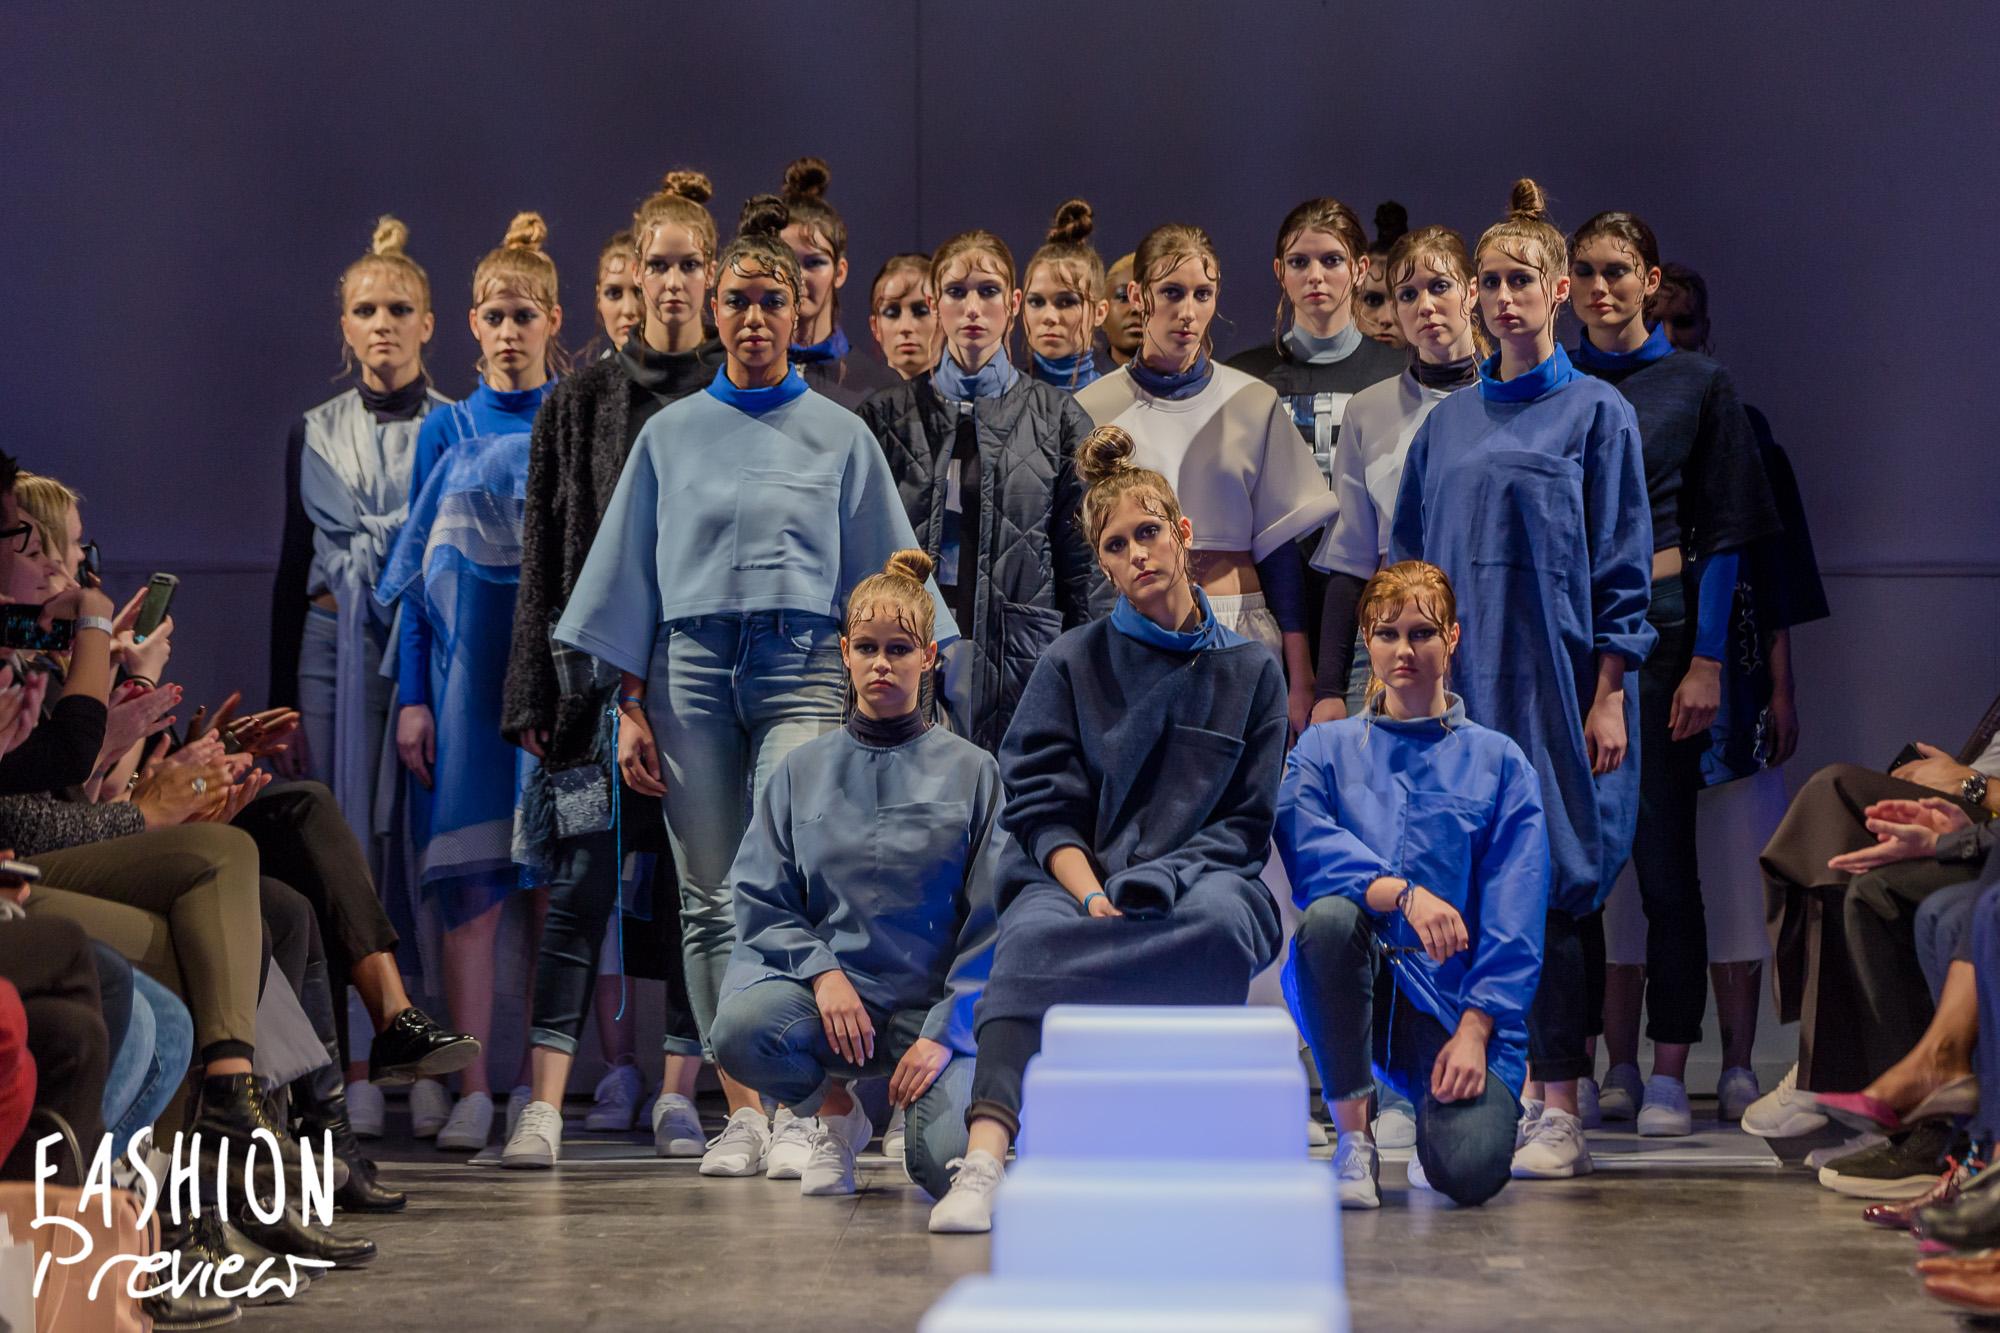 Fashion Preview 9 - Cegep Marie Victorin-25.jpg